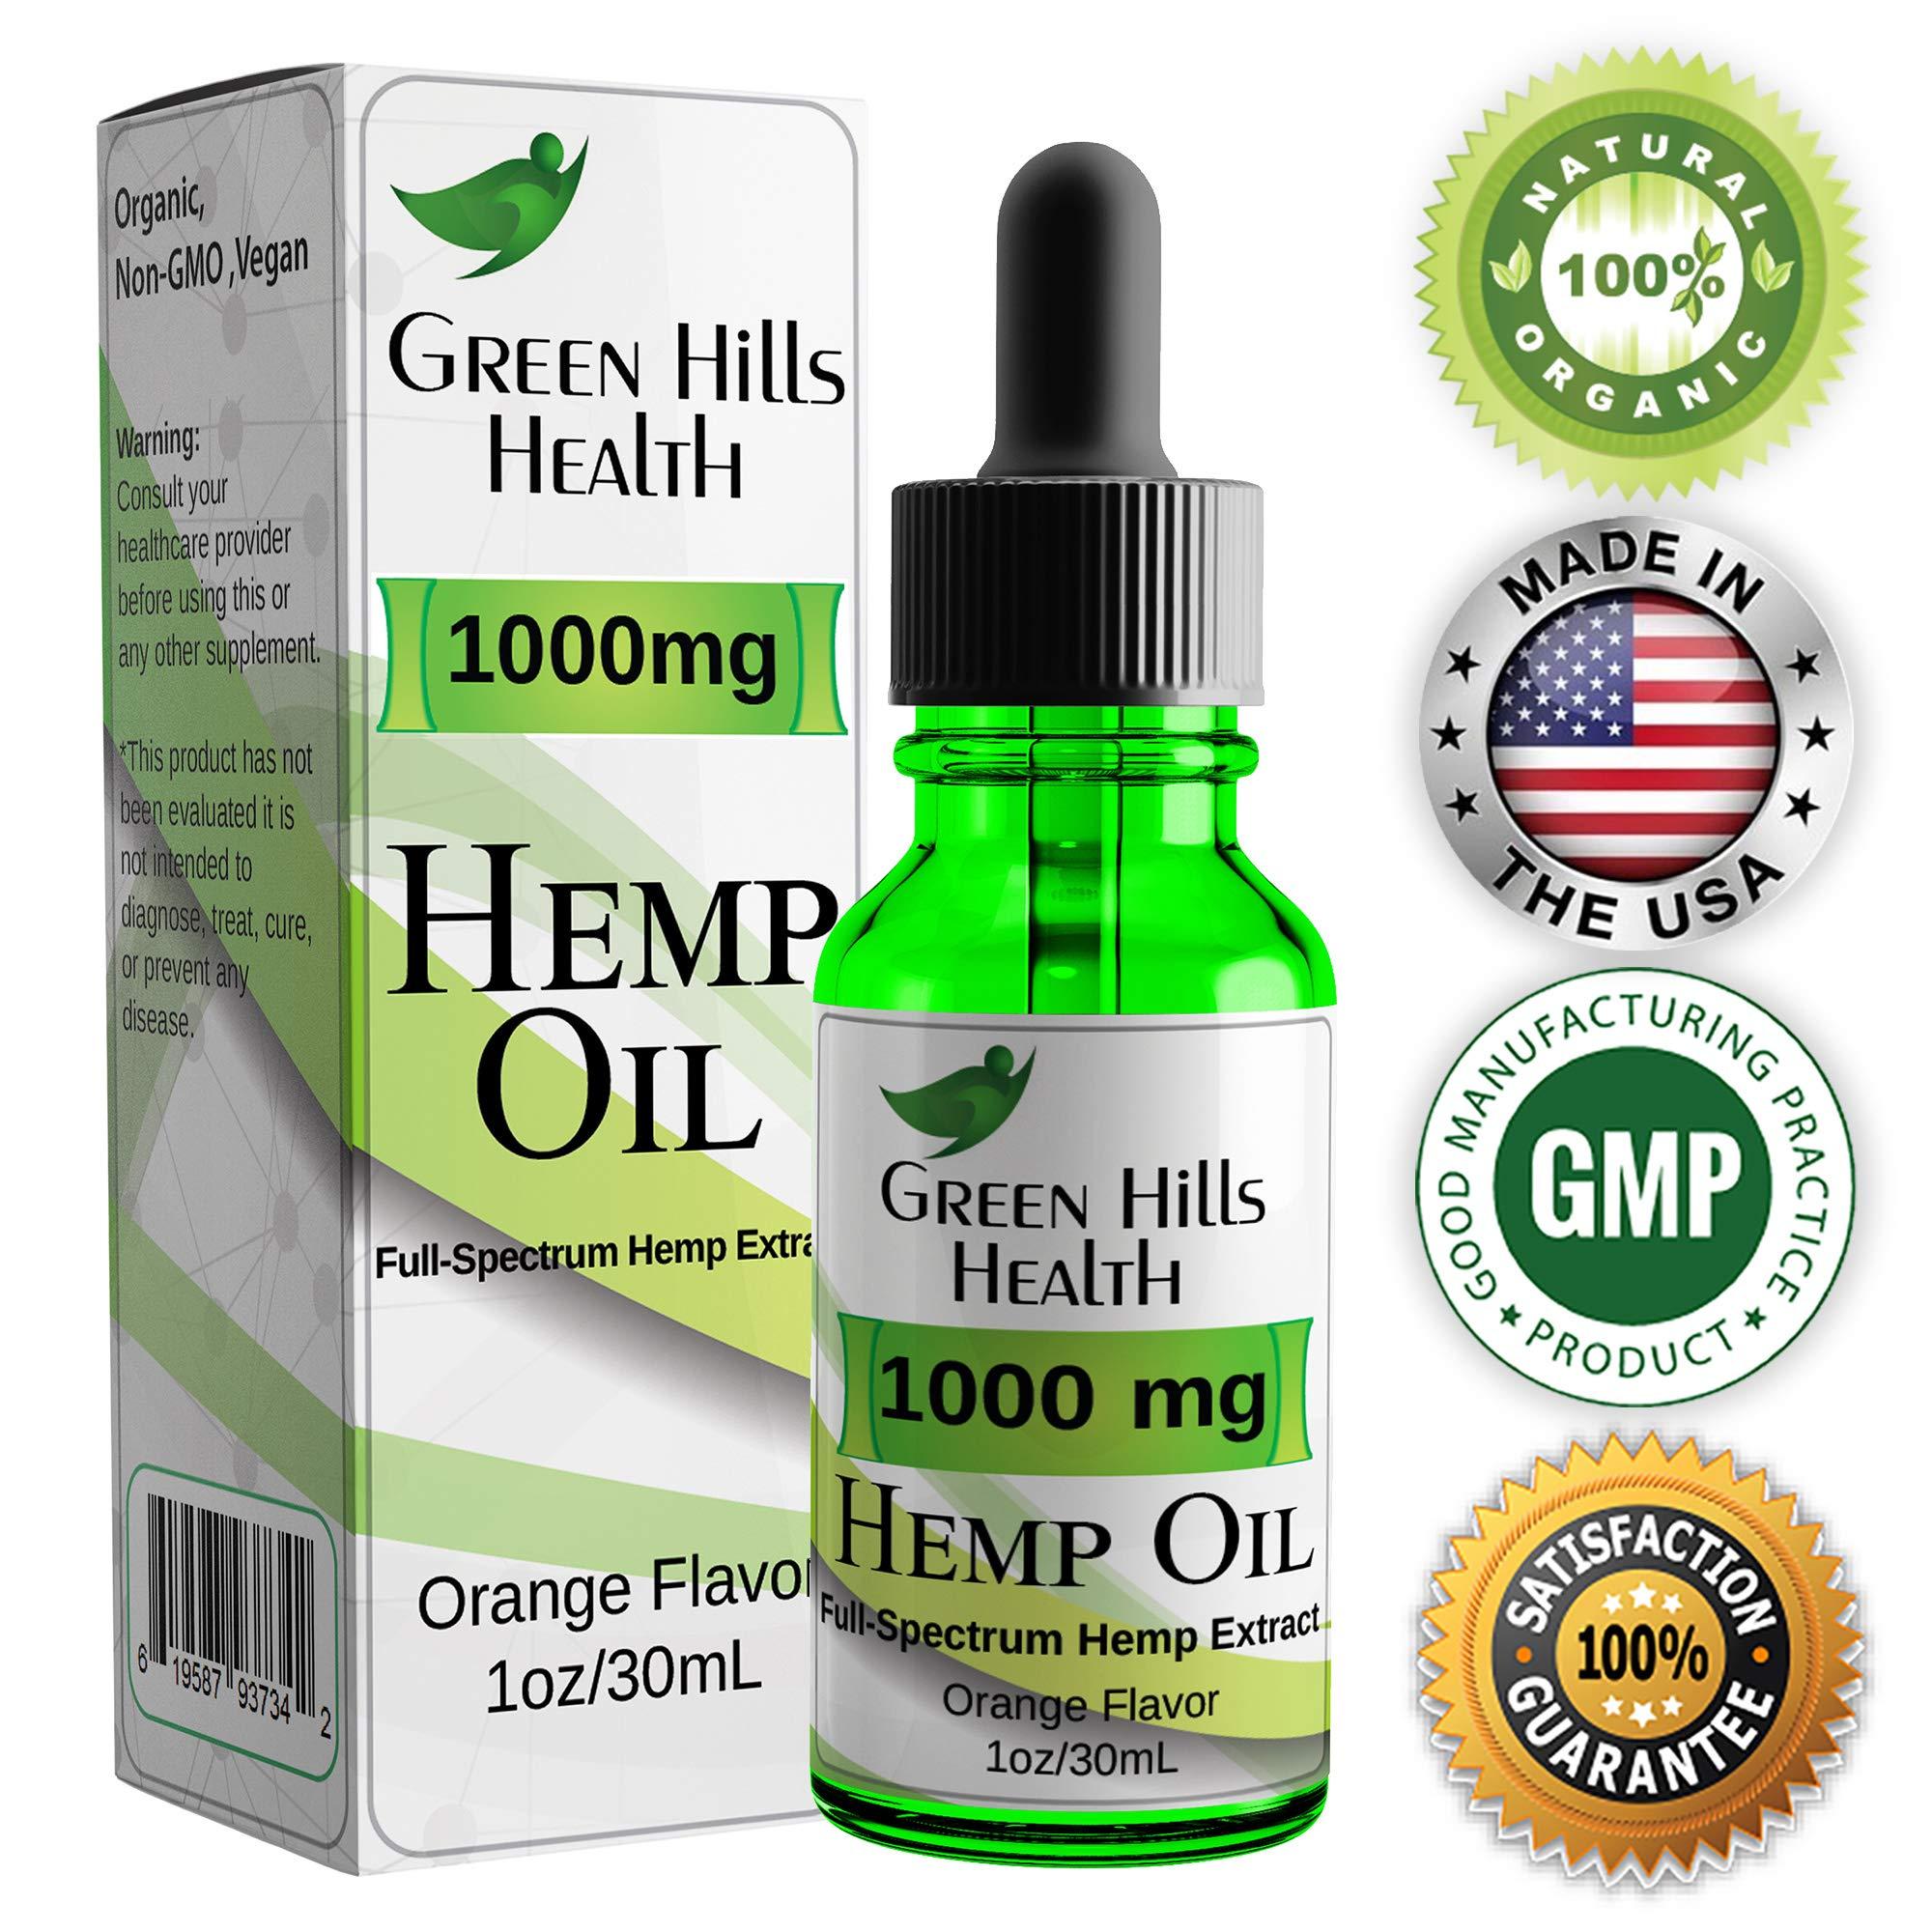 Hemp Oil 1000MG Full Spectrum Premium Hemp Oil for Pain Anxiety, Stress and Inflammation. Improves Mood Sleep Skin & Hair Organic Vegan Non-GMO Orange Flavor 1 Fl Oz Low Intro Price